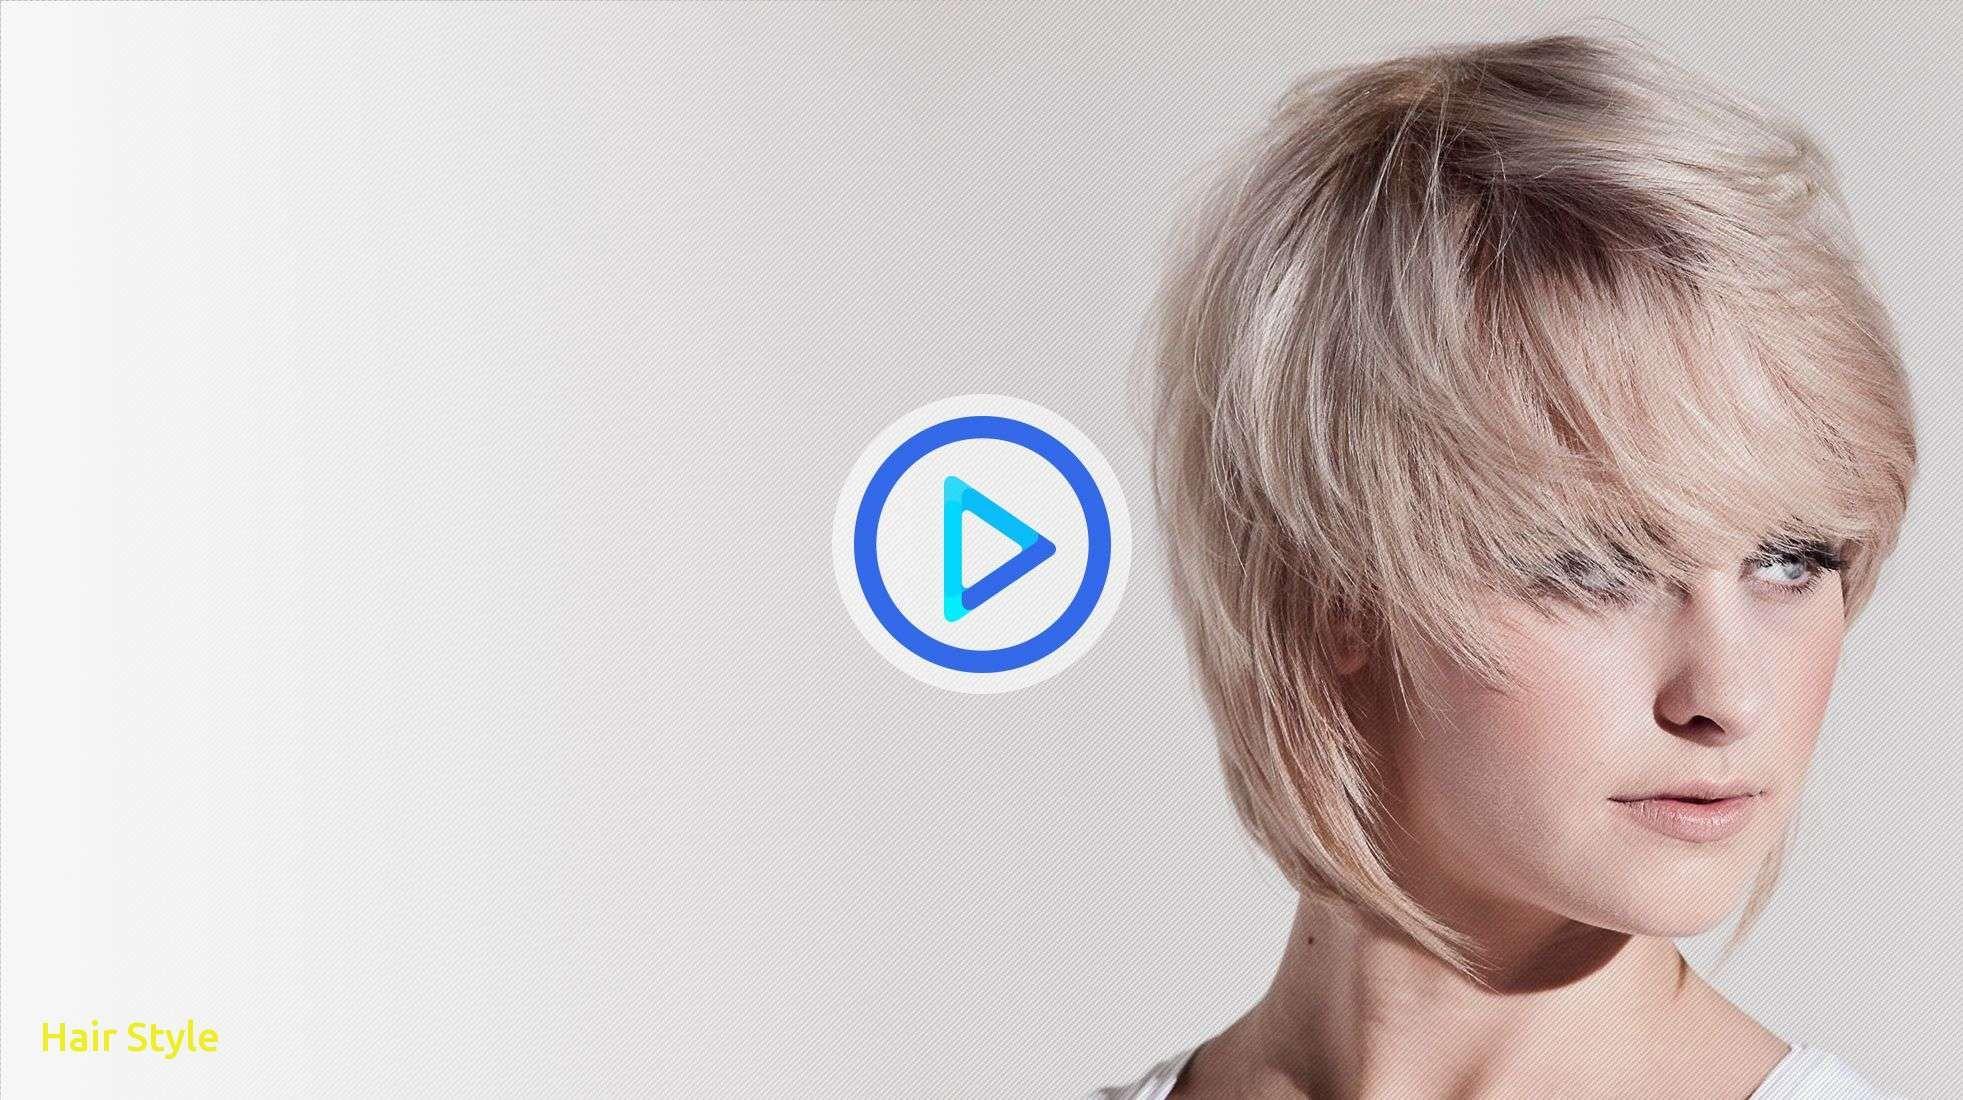 Account Suspended Haarschnitt Frisur Ideen Bob Frisur